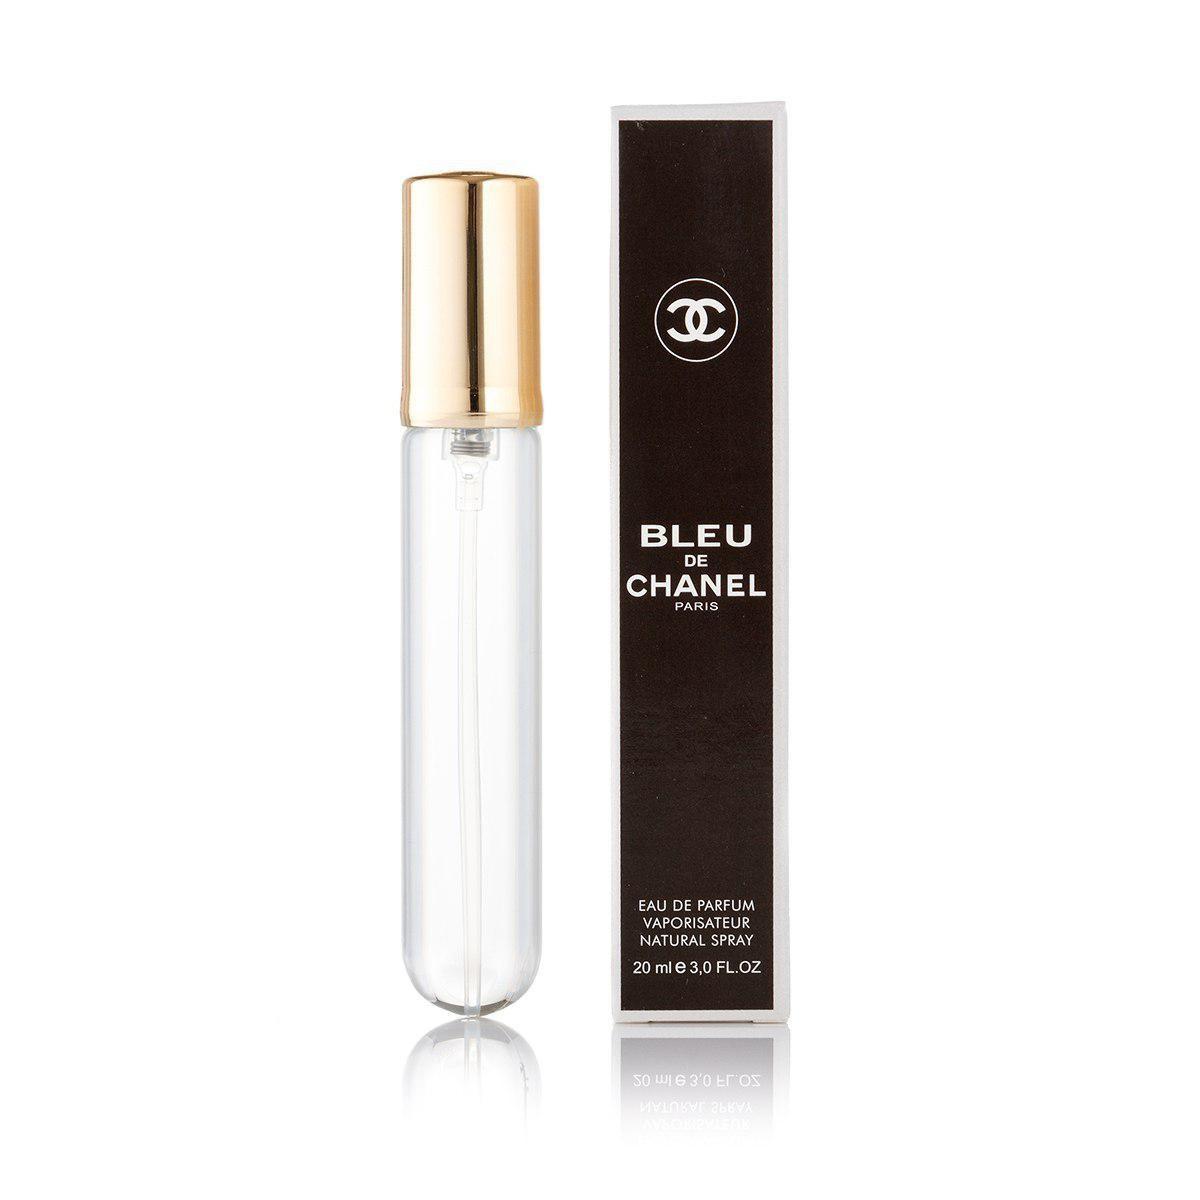 20 мл мини-парфюм Chanel Blue de Chanel (м)